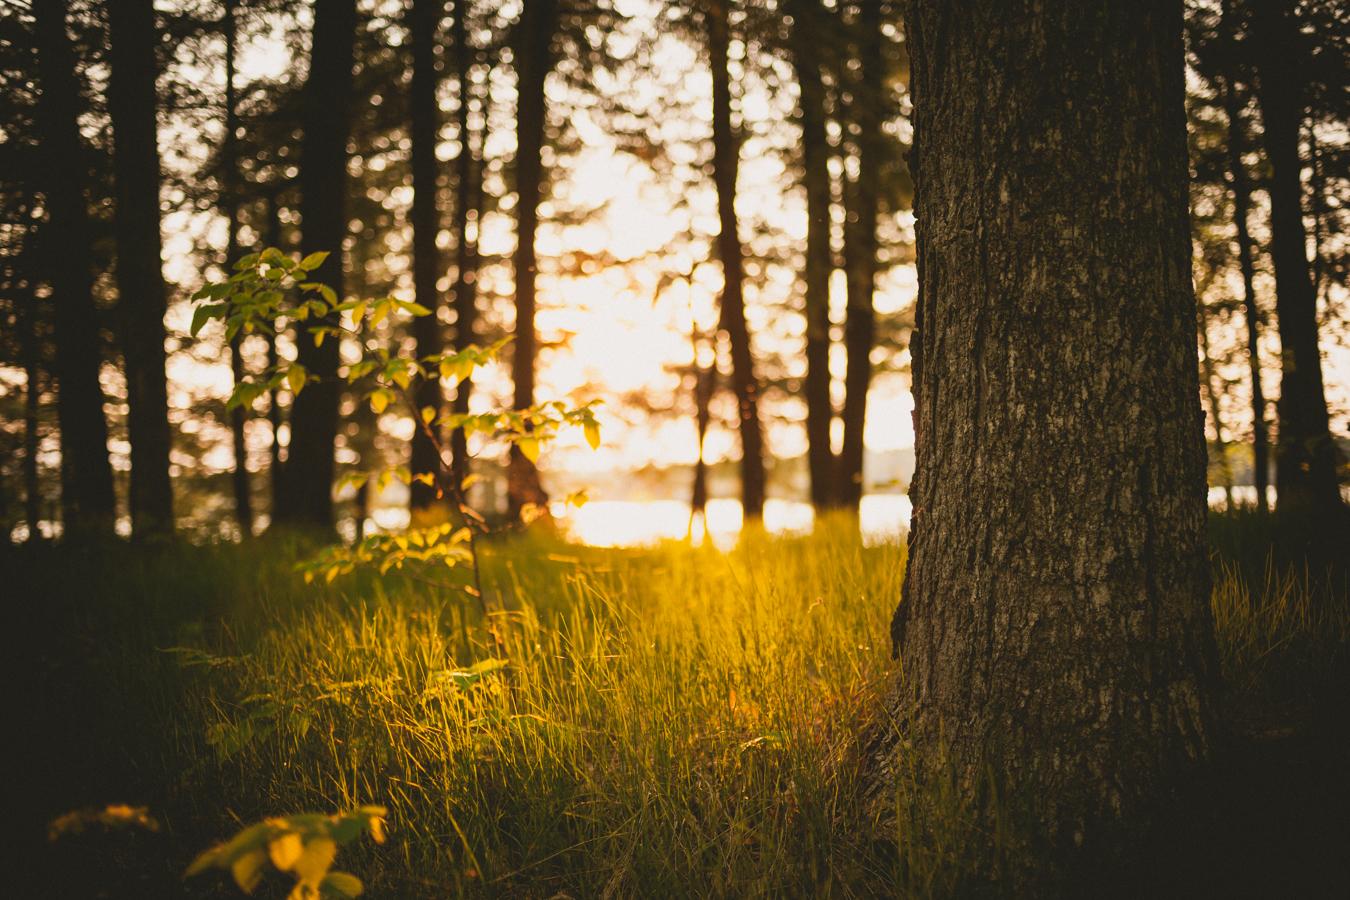 Jonathan_Kuhn_Photography_-6.JPG